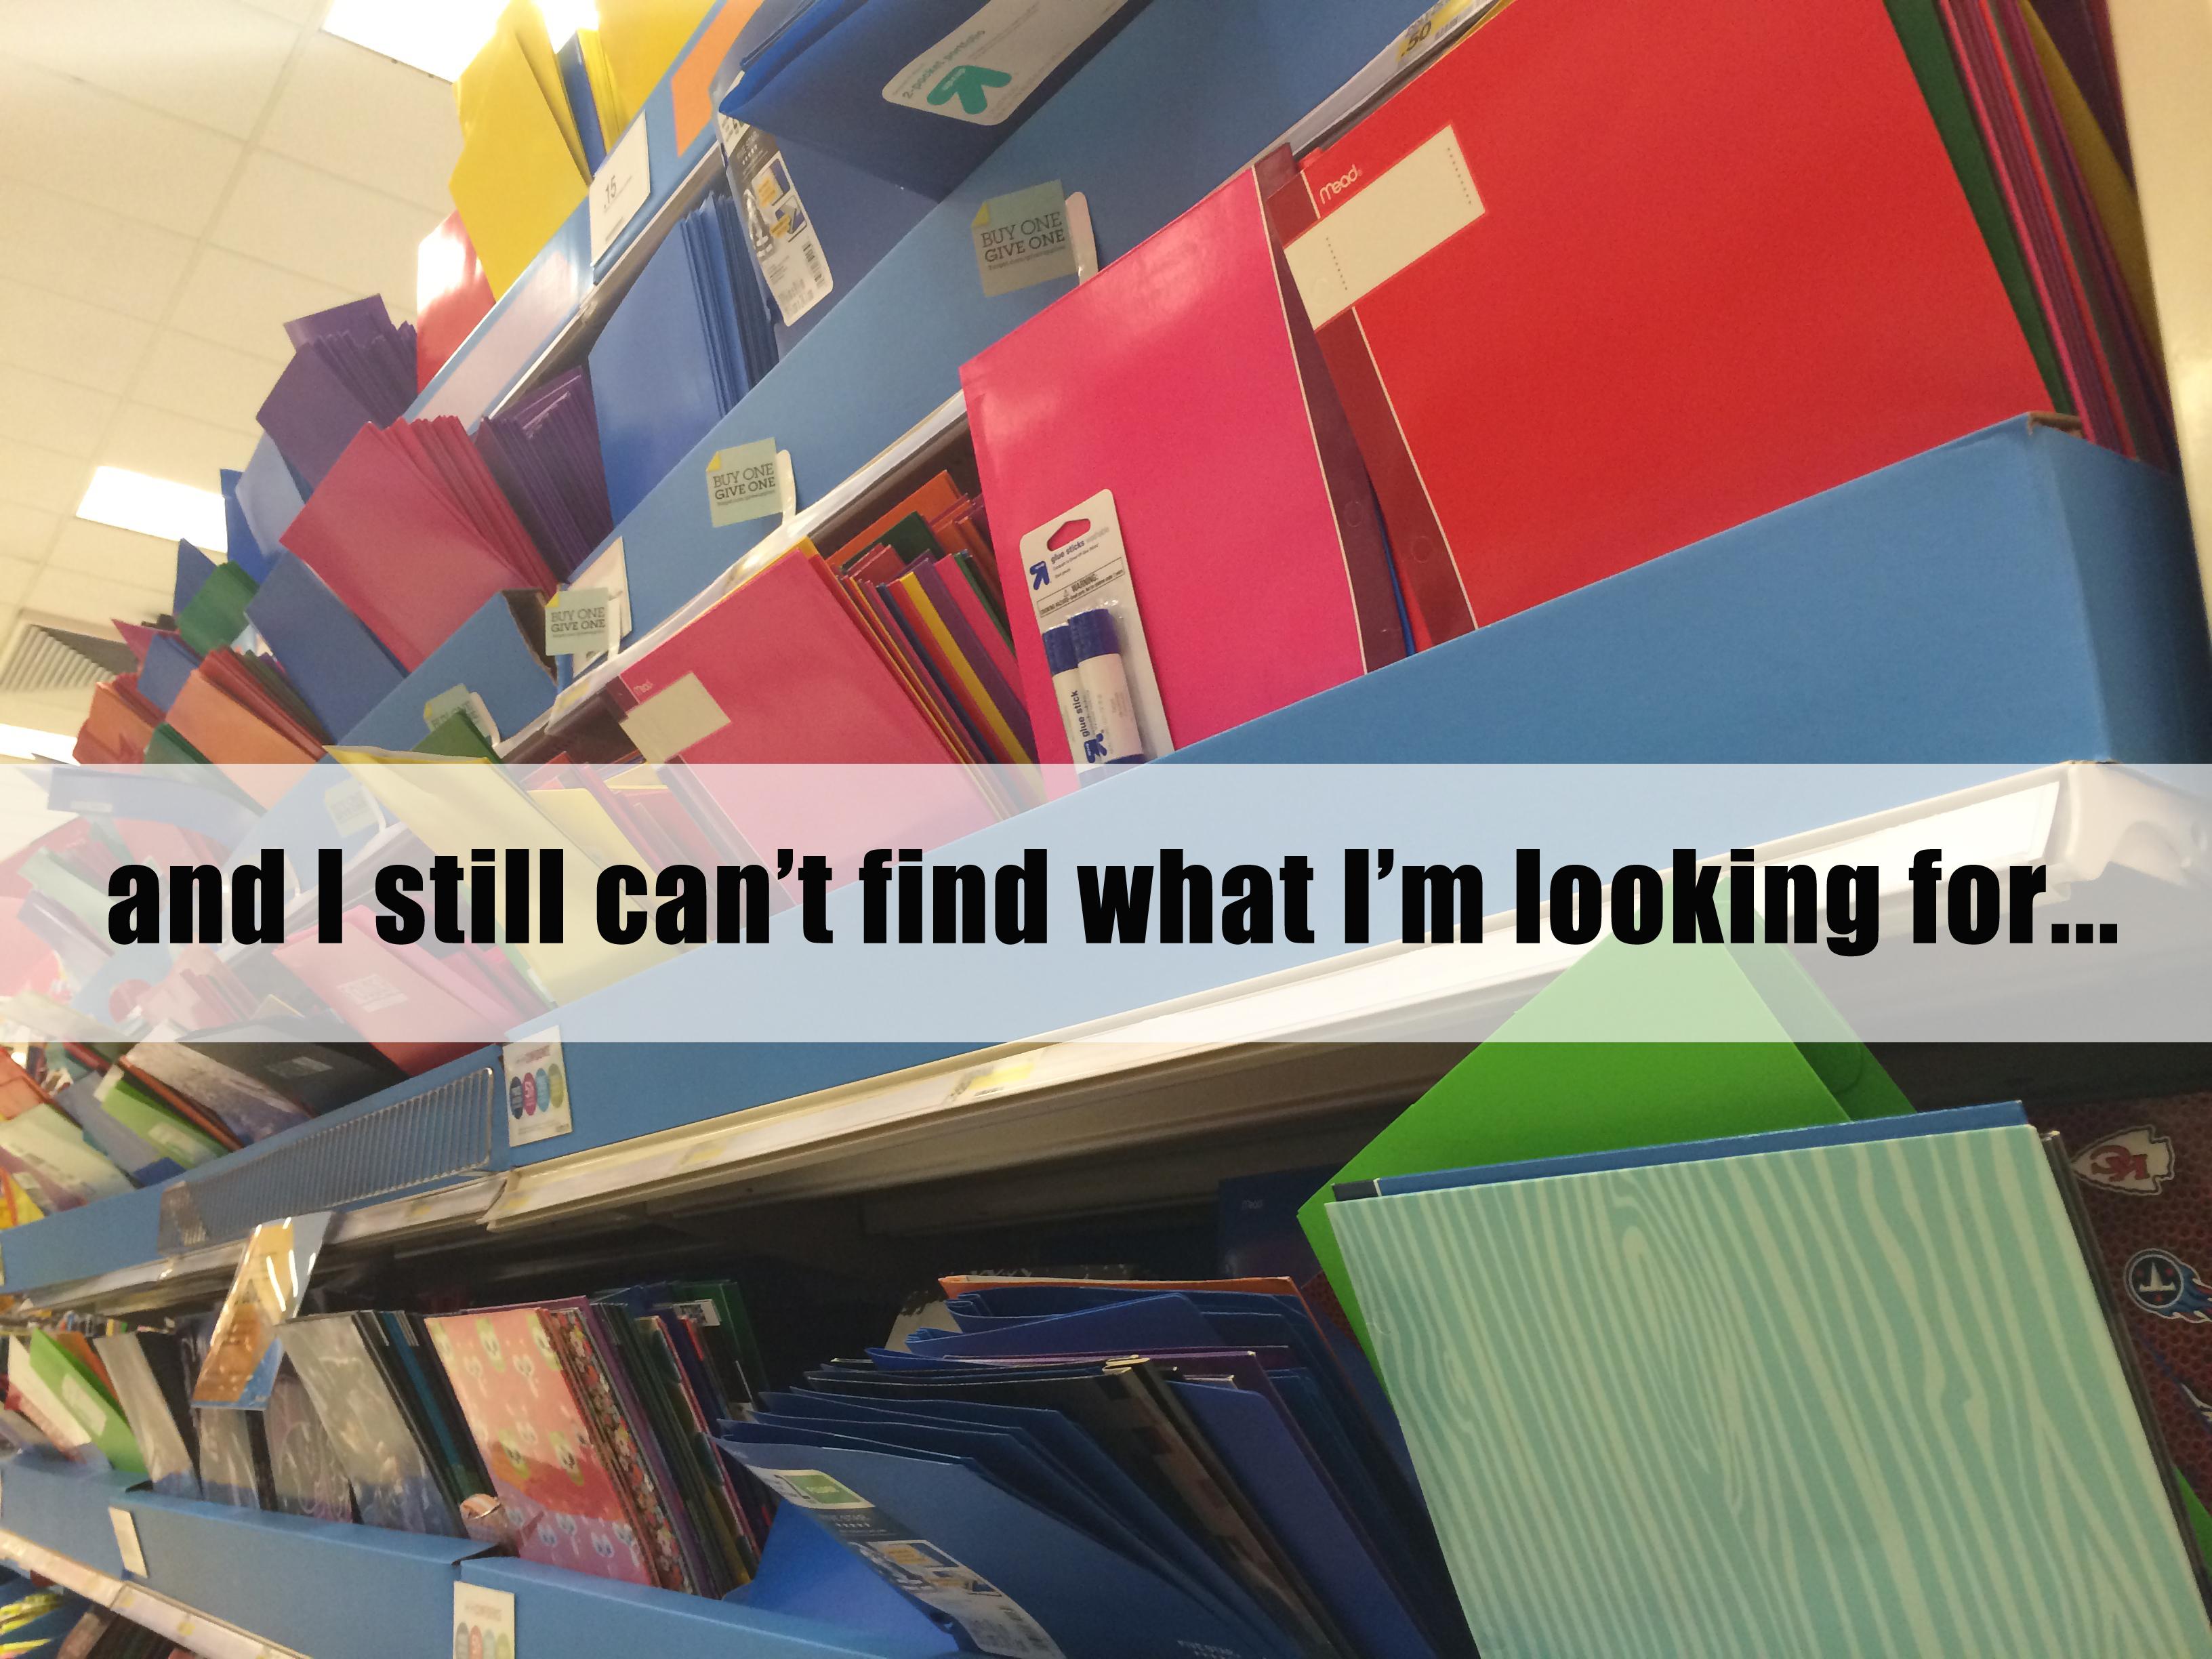 Still can't find it | Sheknows.com